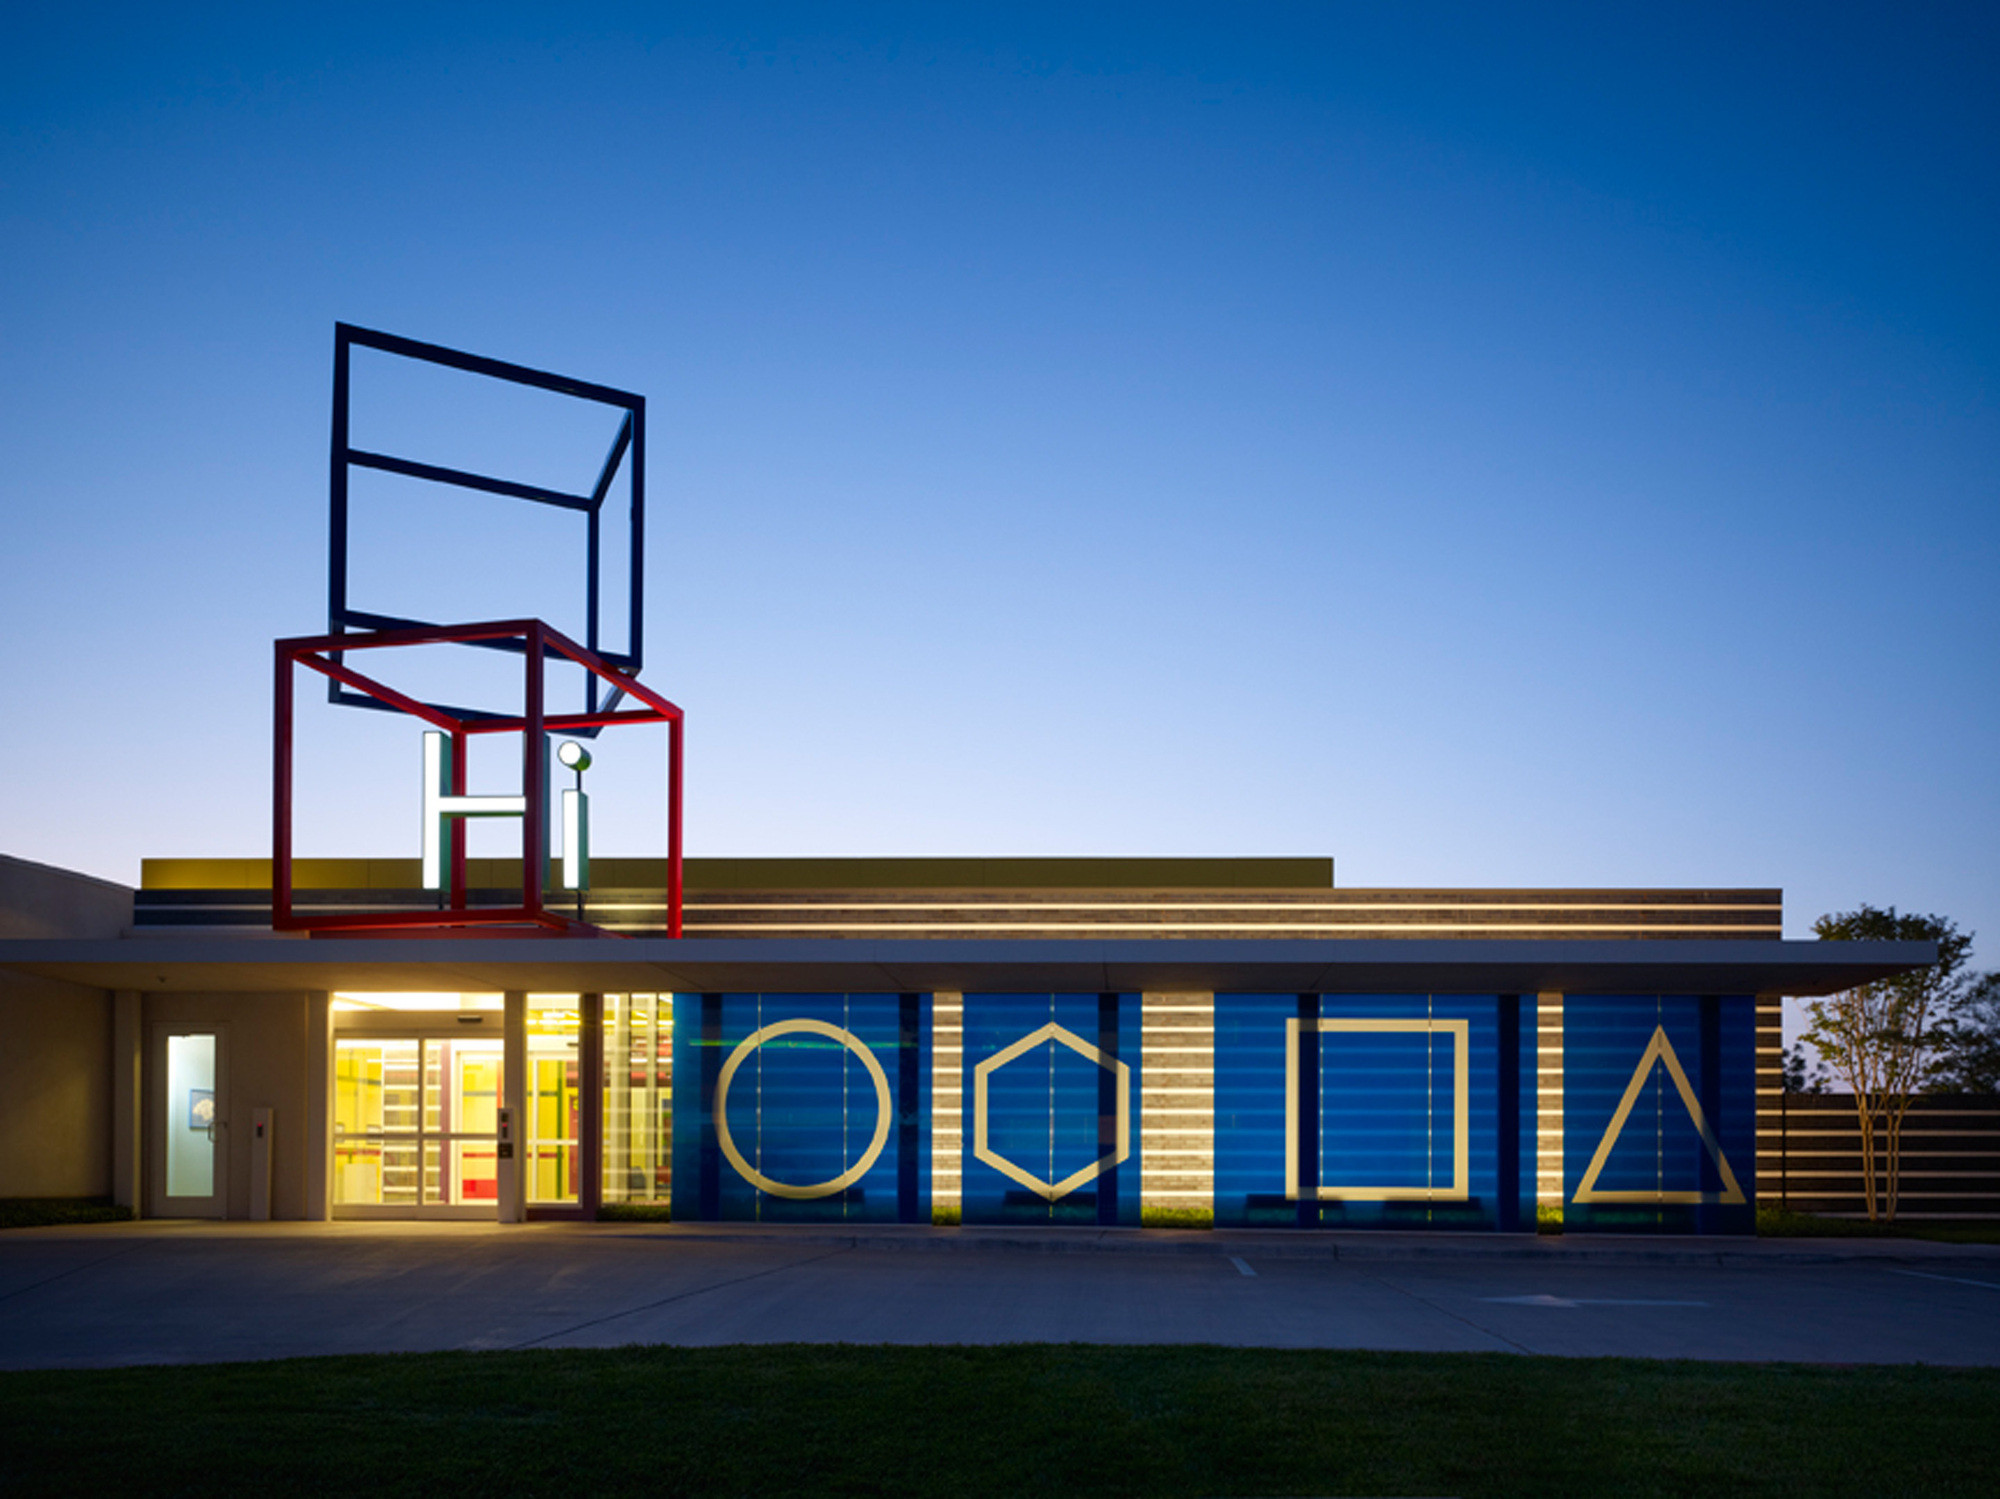 EAA to Design Oklahoma Contemporary Arts Center, Chesapeake Child Development Center / Elliott + Associates Architects (Click image for more). Image © Hedrich Blessing; Scott McDonald